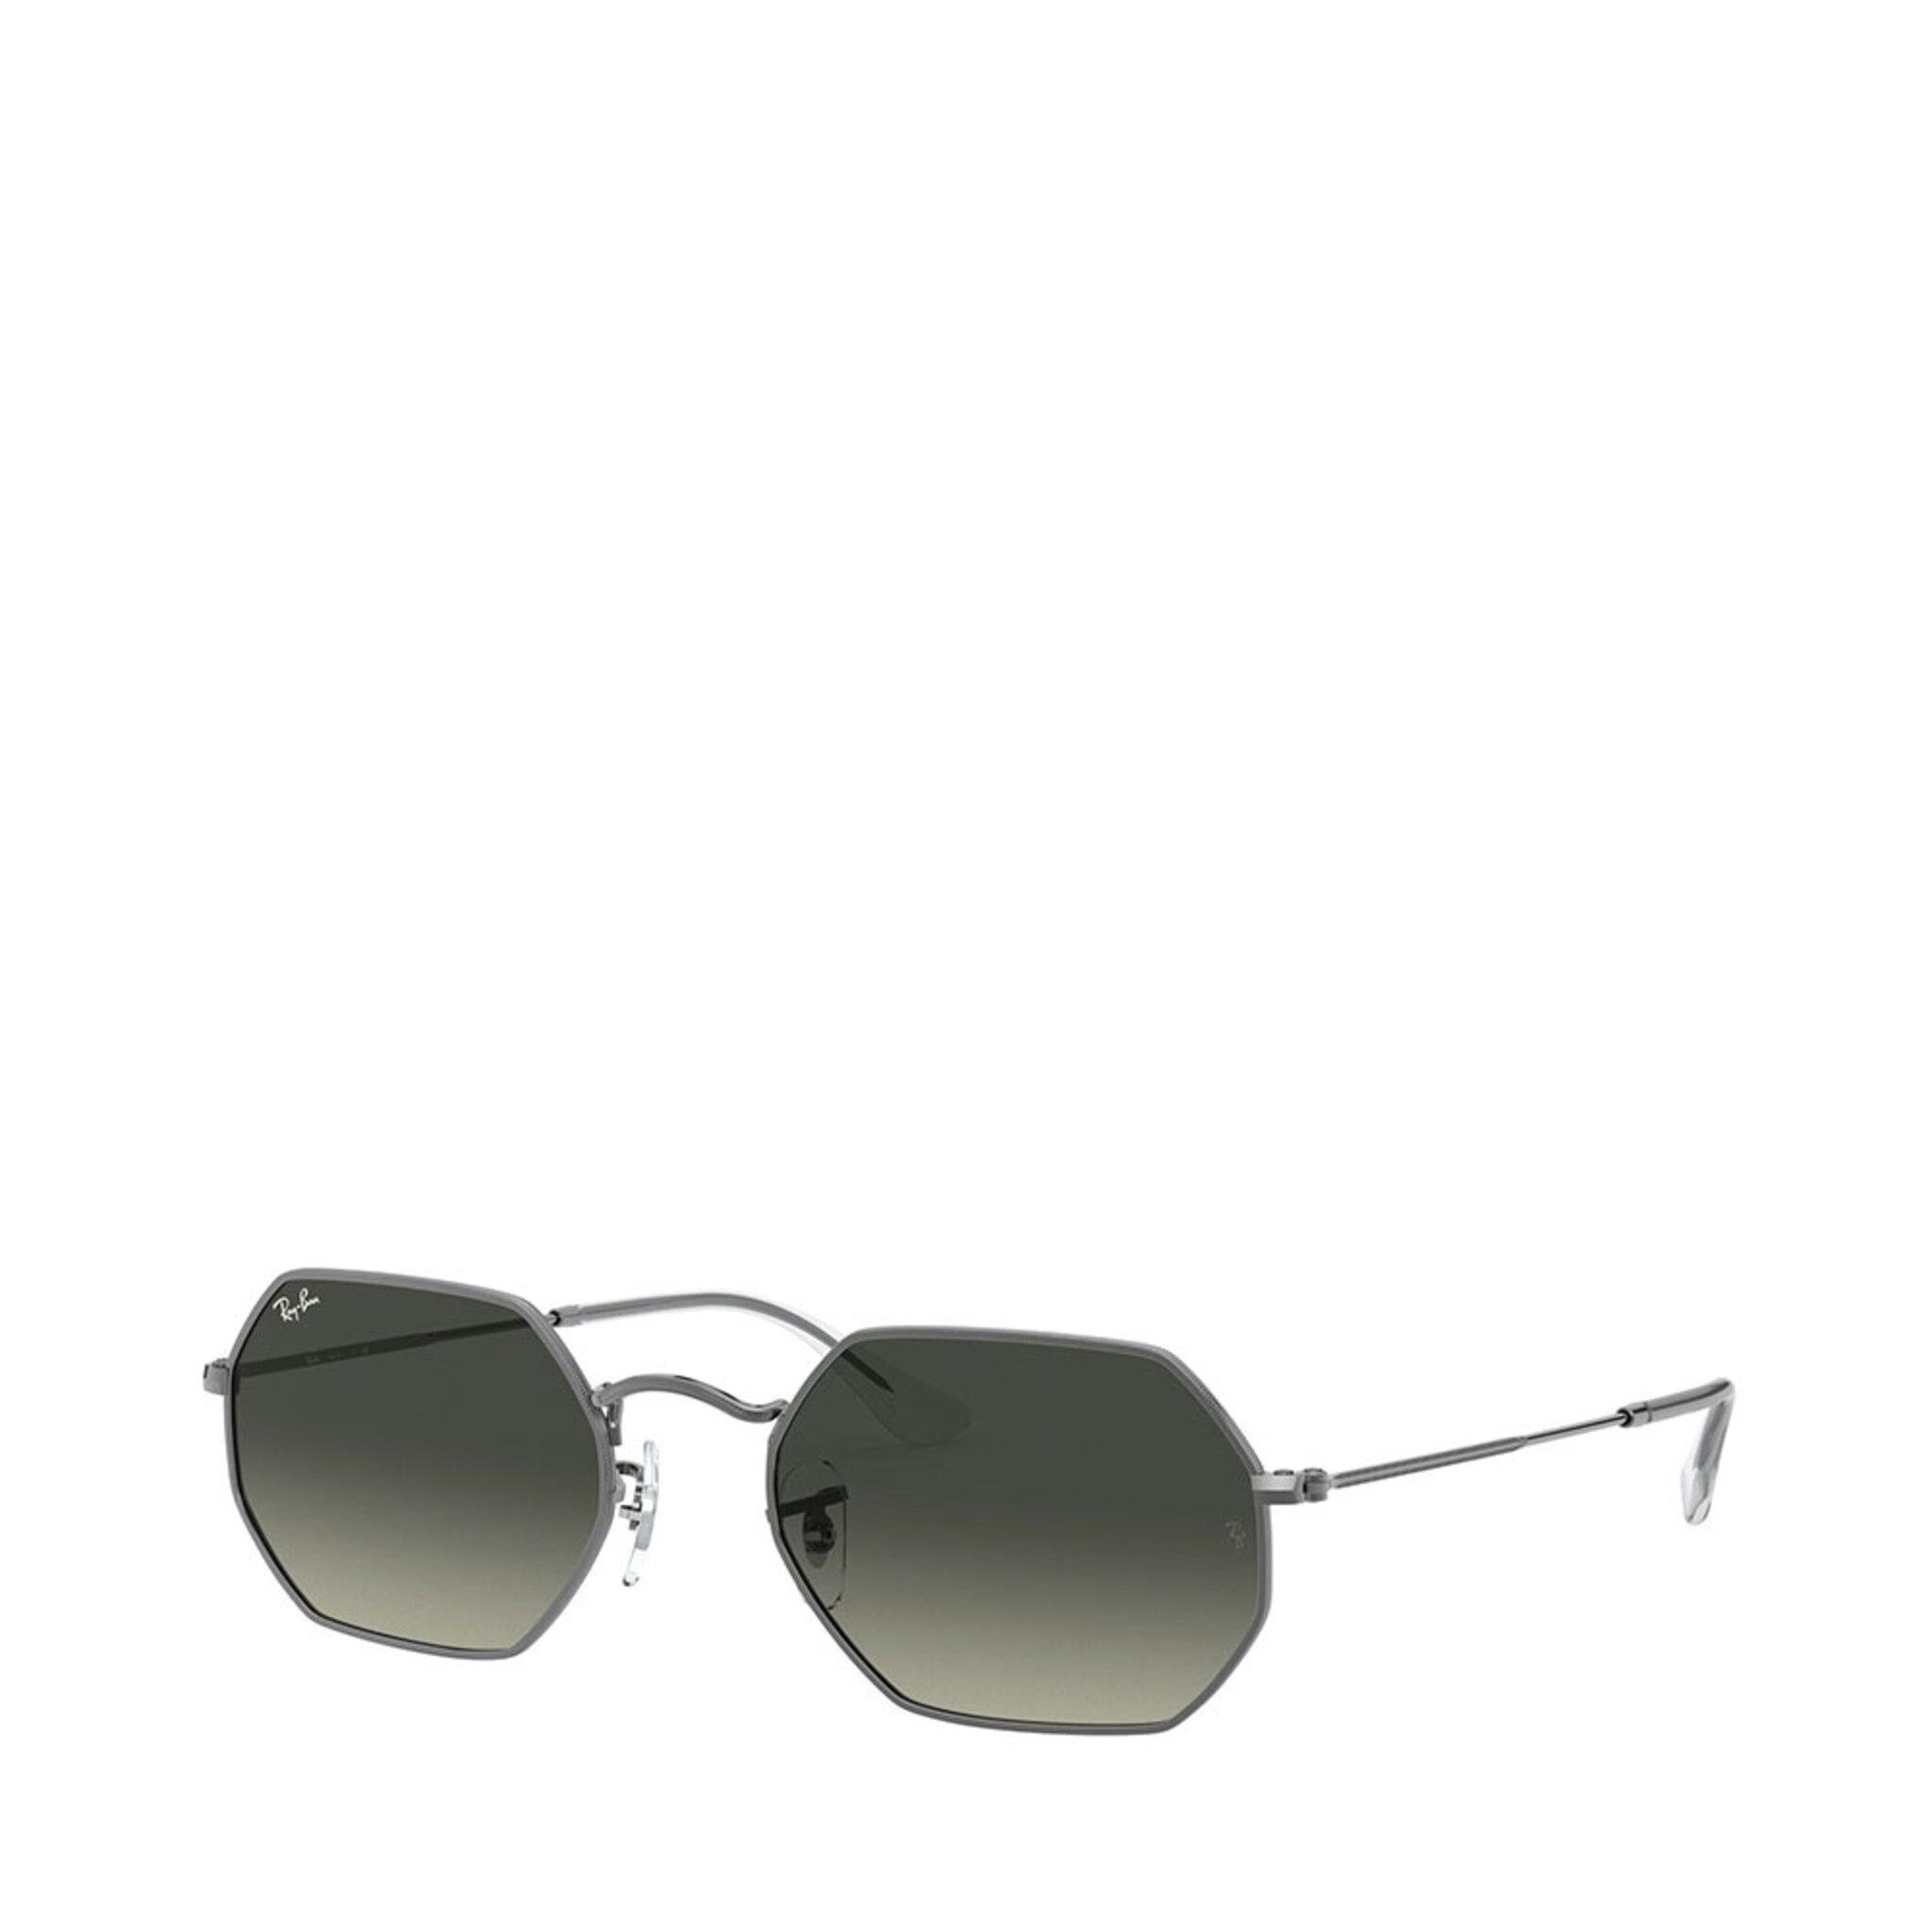 Sunglasses OCTAGONAL